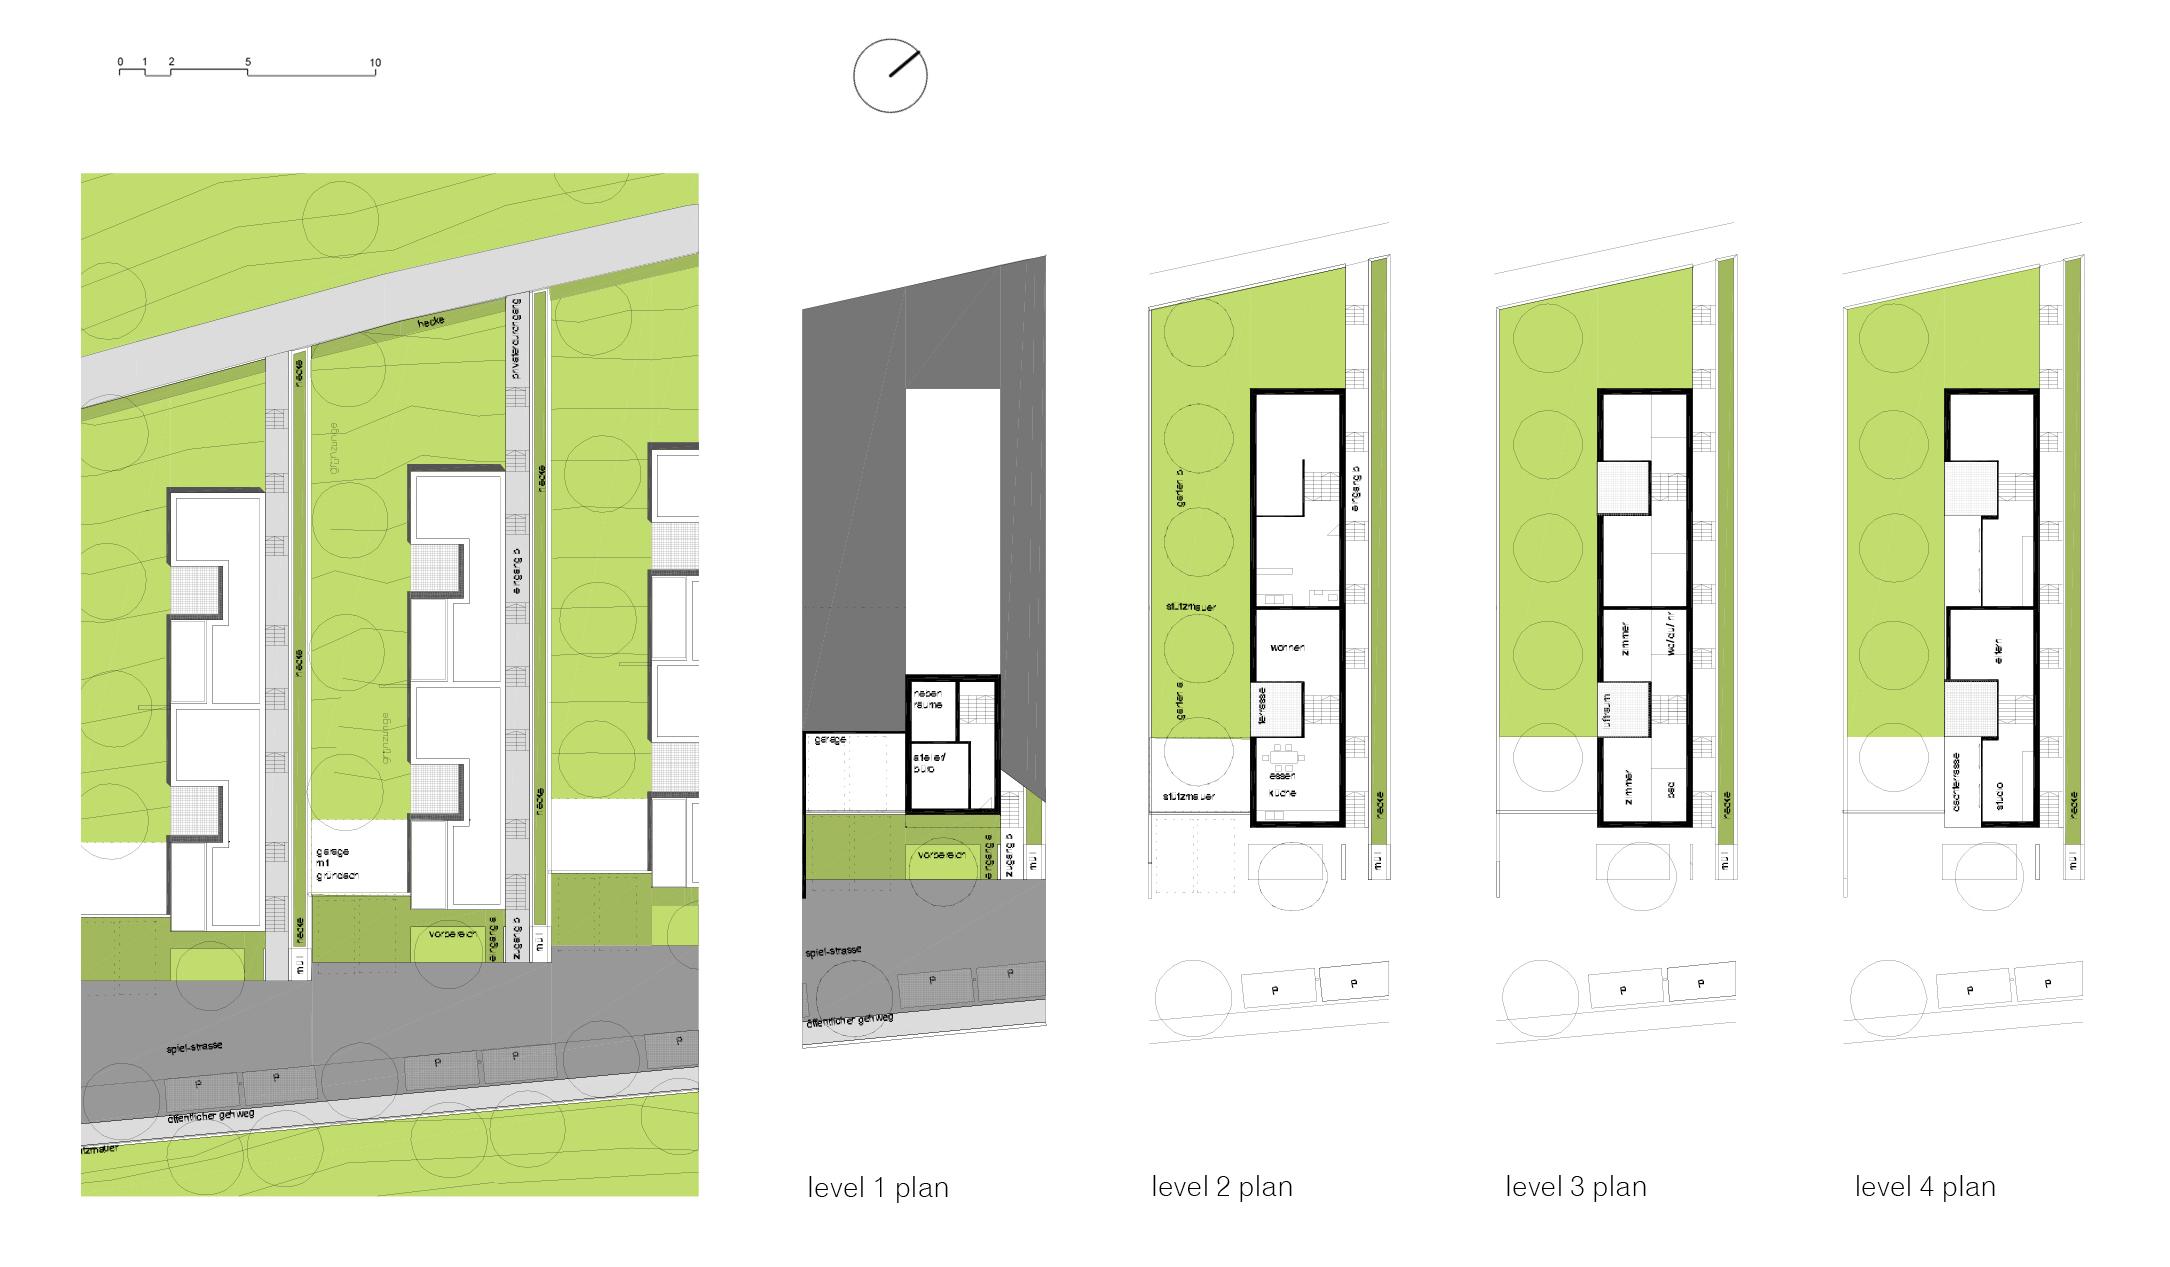 Hanghäuser hanghäuser gottesäcker henchion reuter architekten